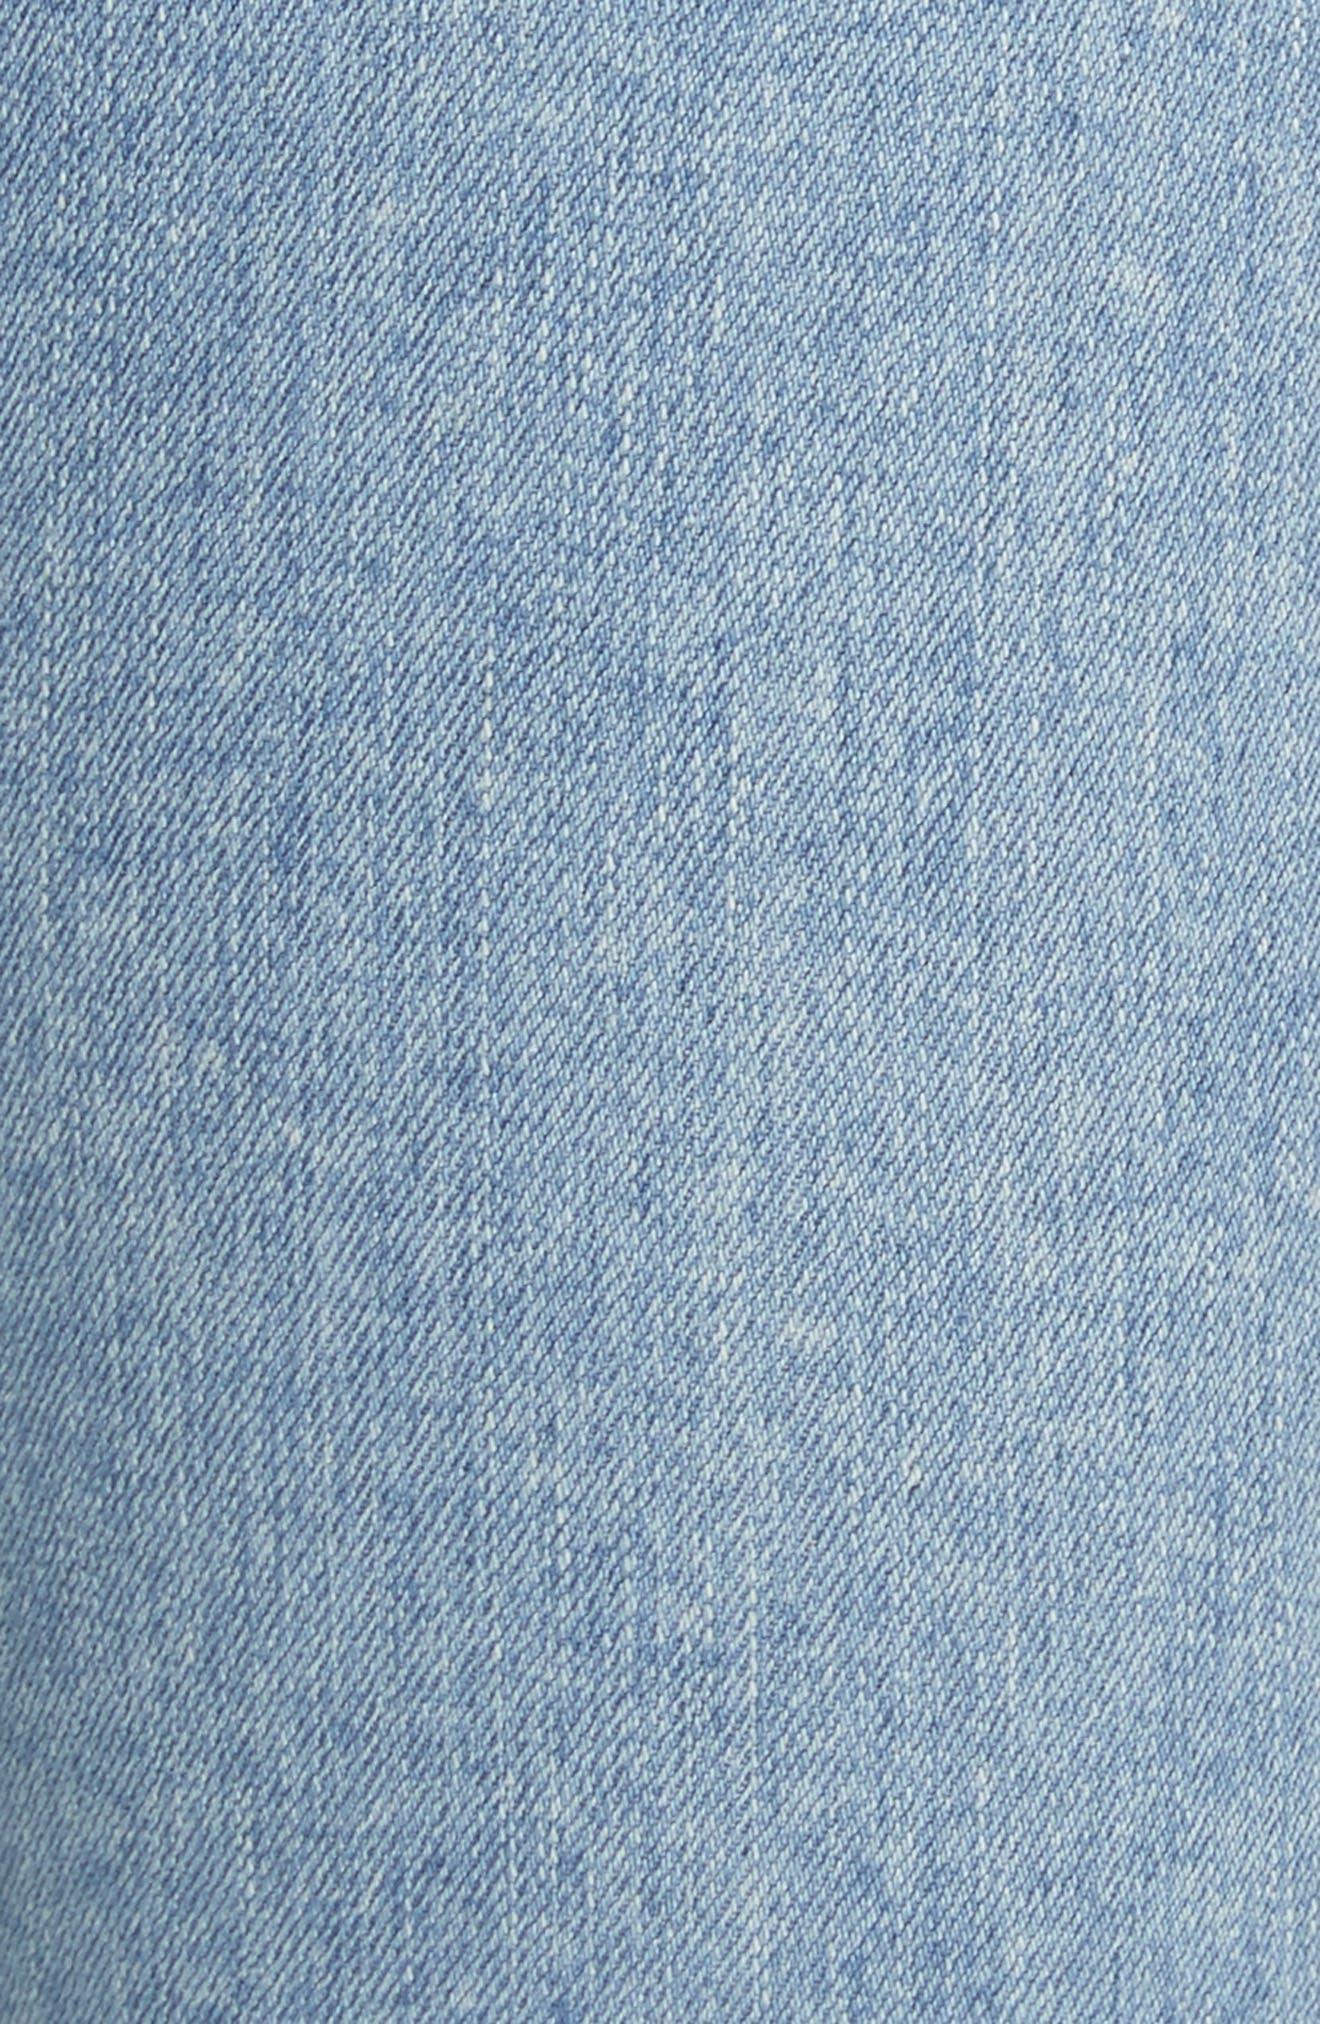 Phila Skinny Jeans,                             Alternate thumbnail 5, color,                             450